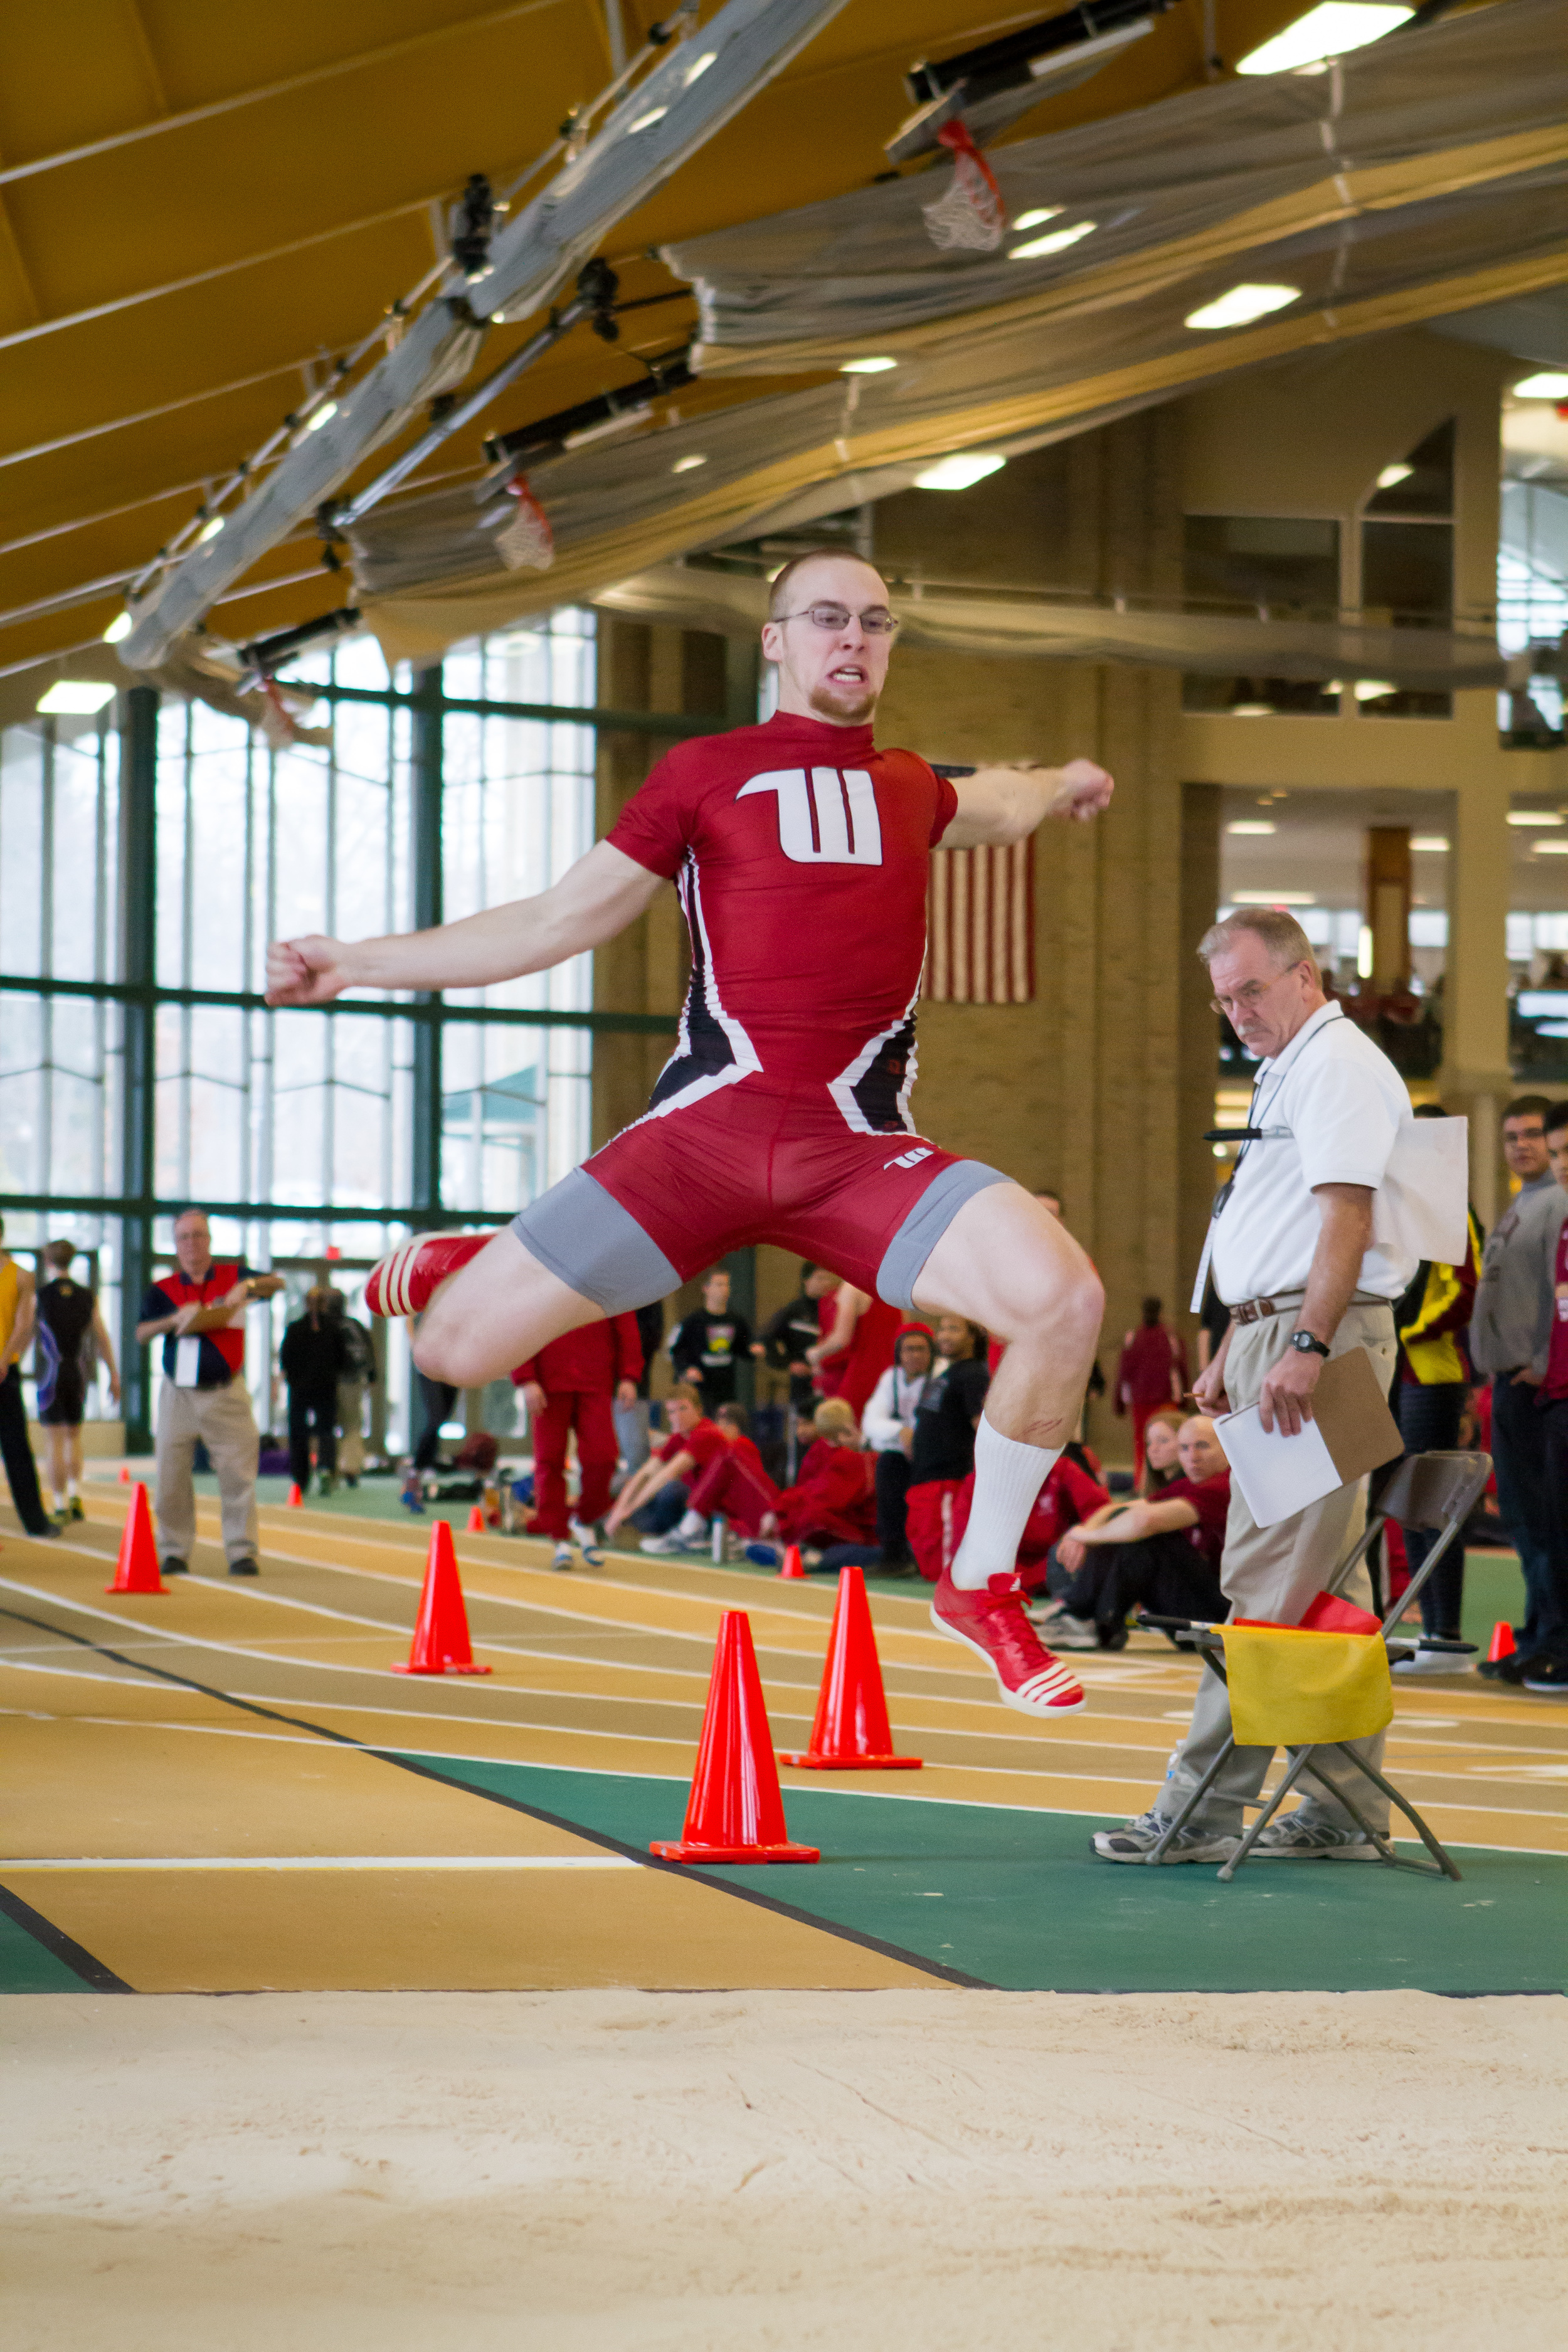 photo credit - Wittenberg Athletics